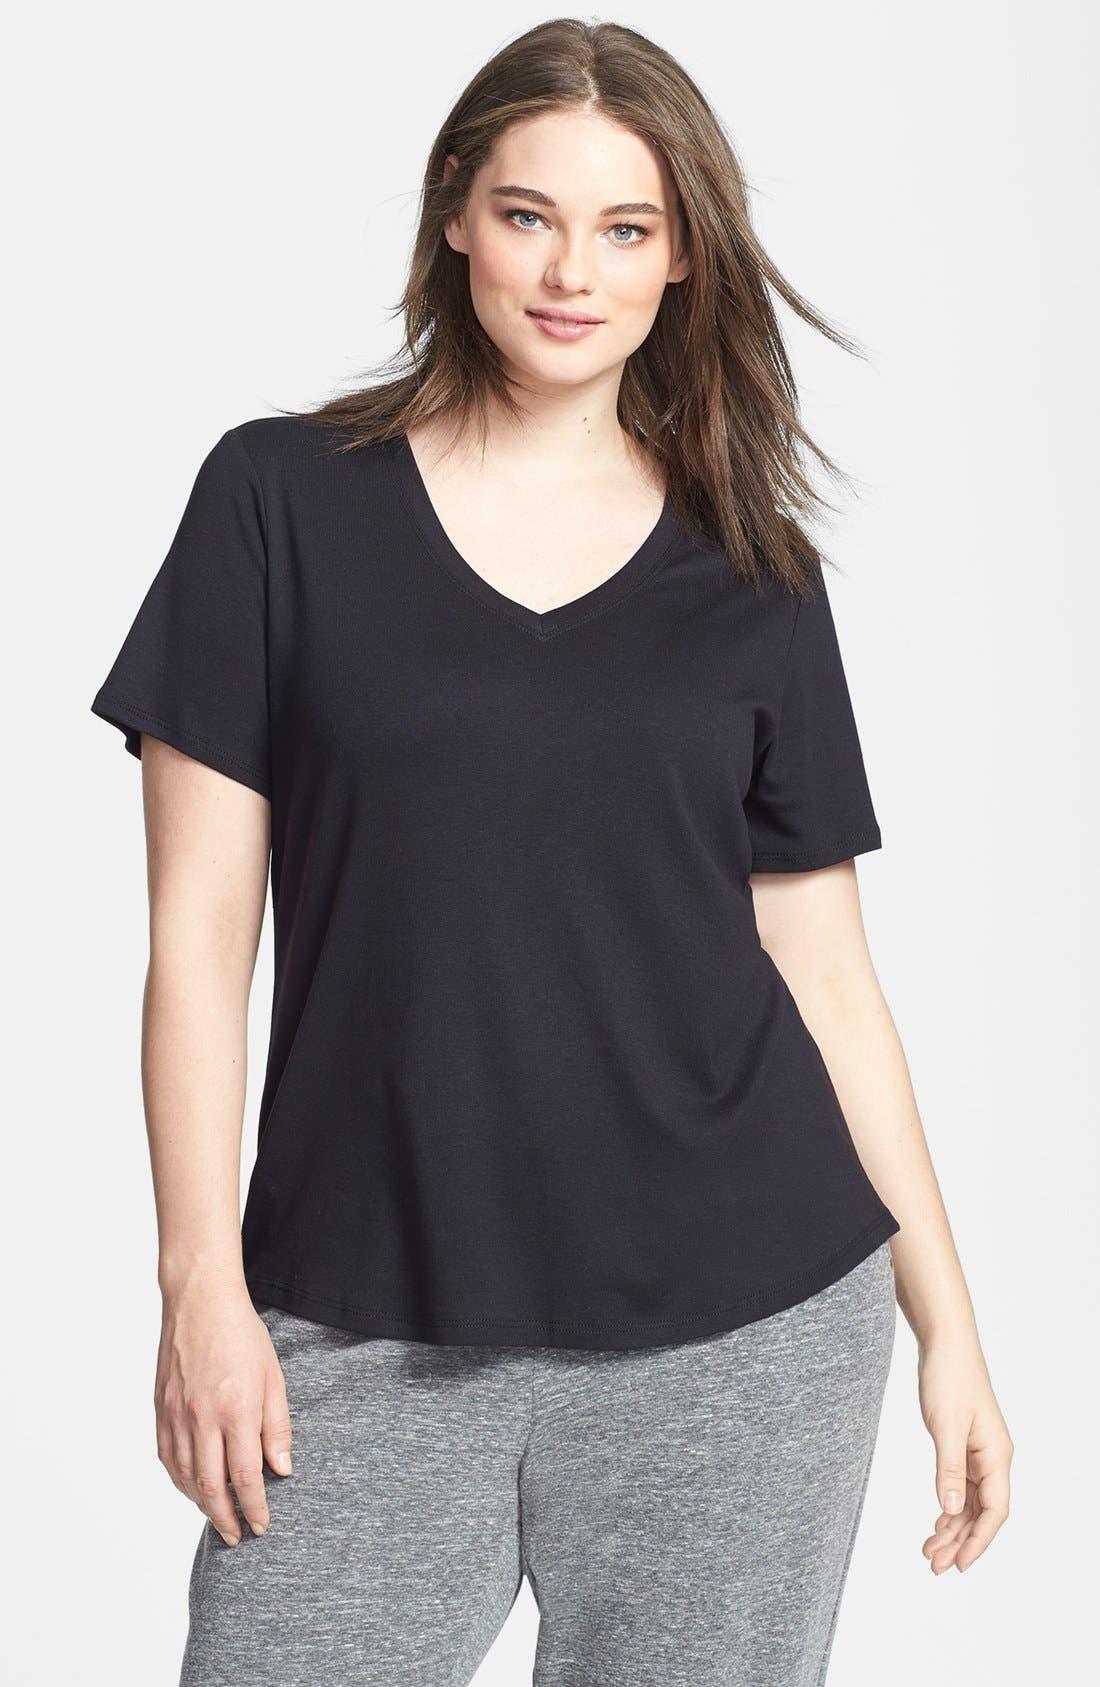 Alternate Image 1 Selected - Sejour Short Sleeve V-Neck Tee (Plus Size)